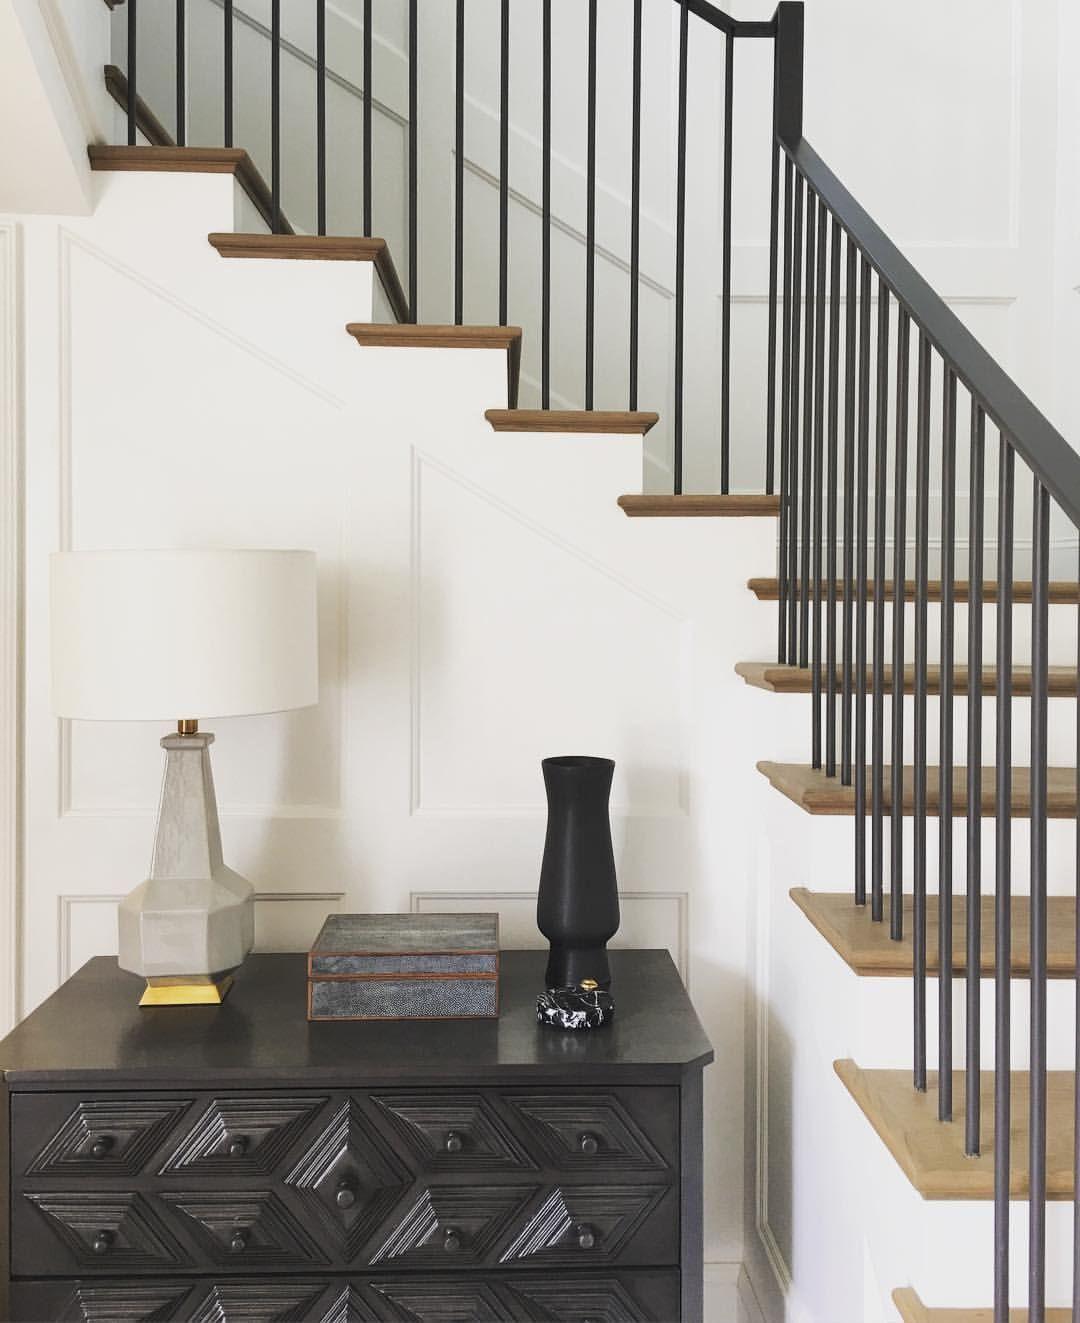 Disc Interiors More Handrail In 2019 Stair Railing   Modern Metal Stair Spindles